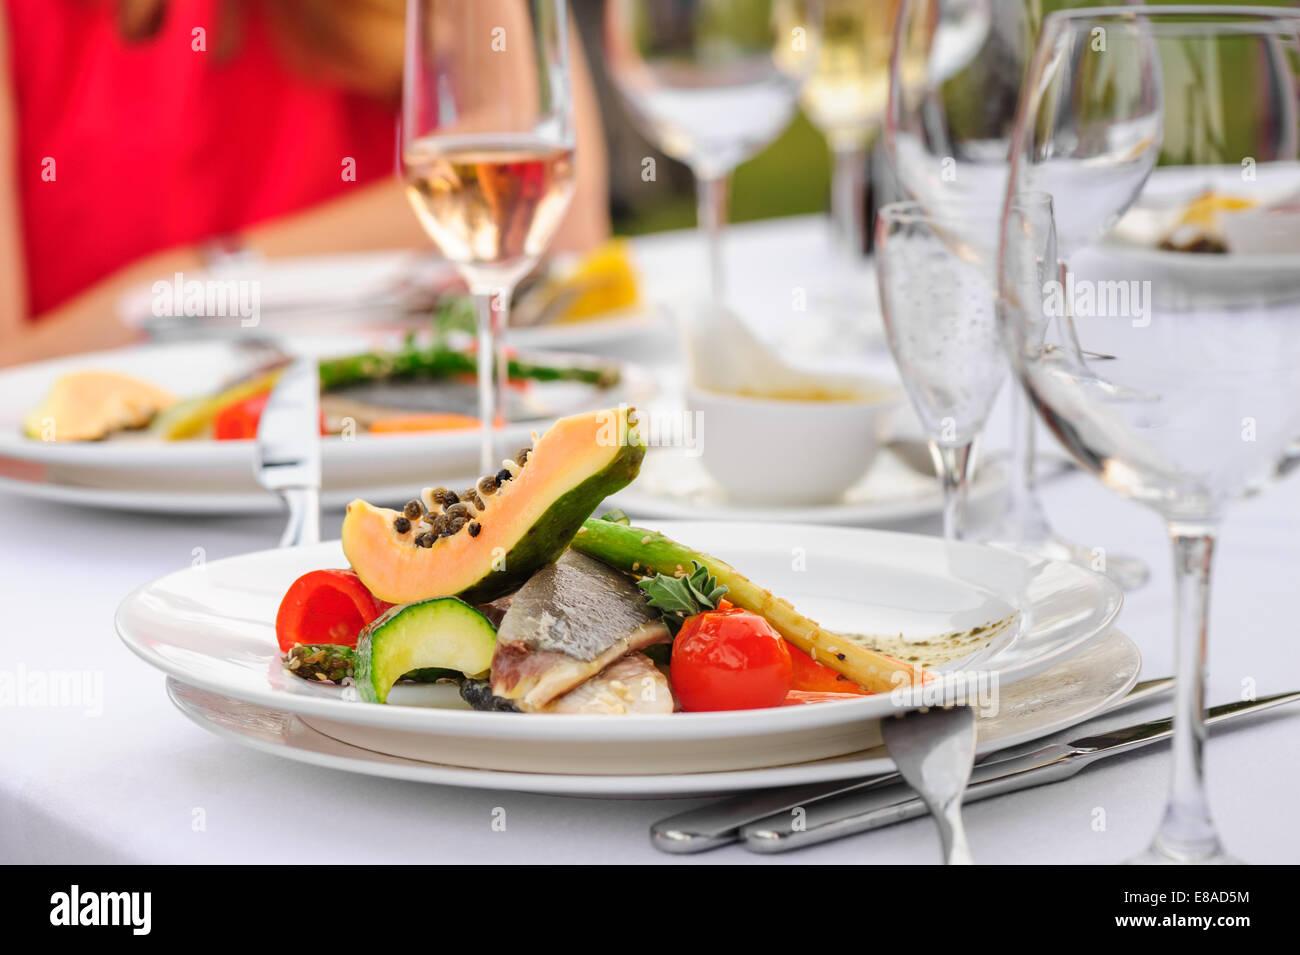 Prepared fish - Stock Image